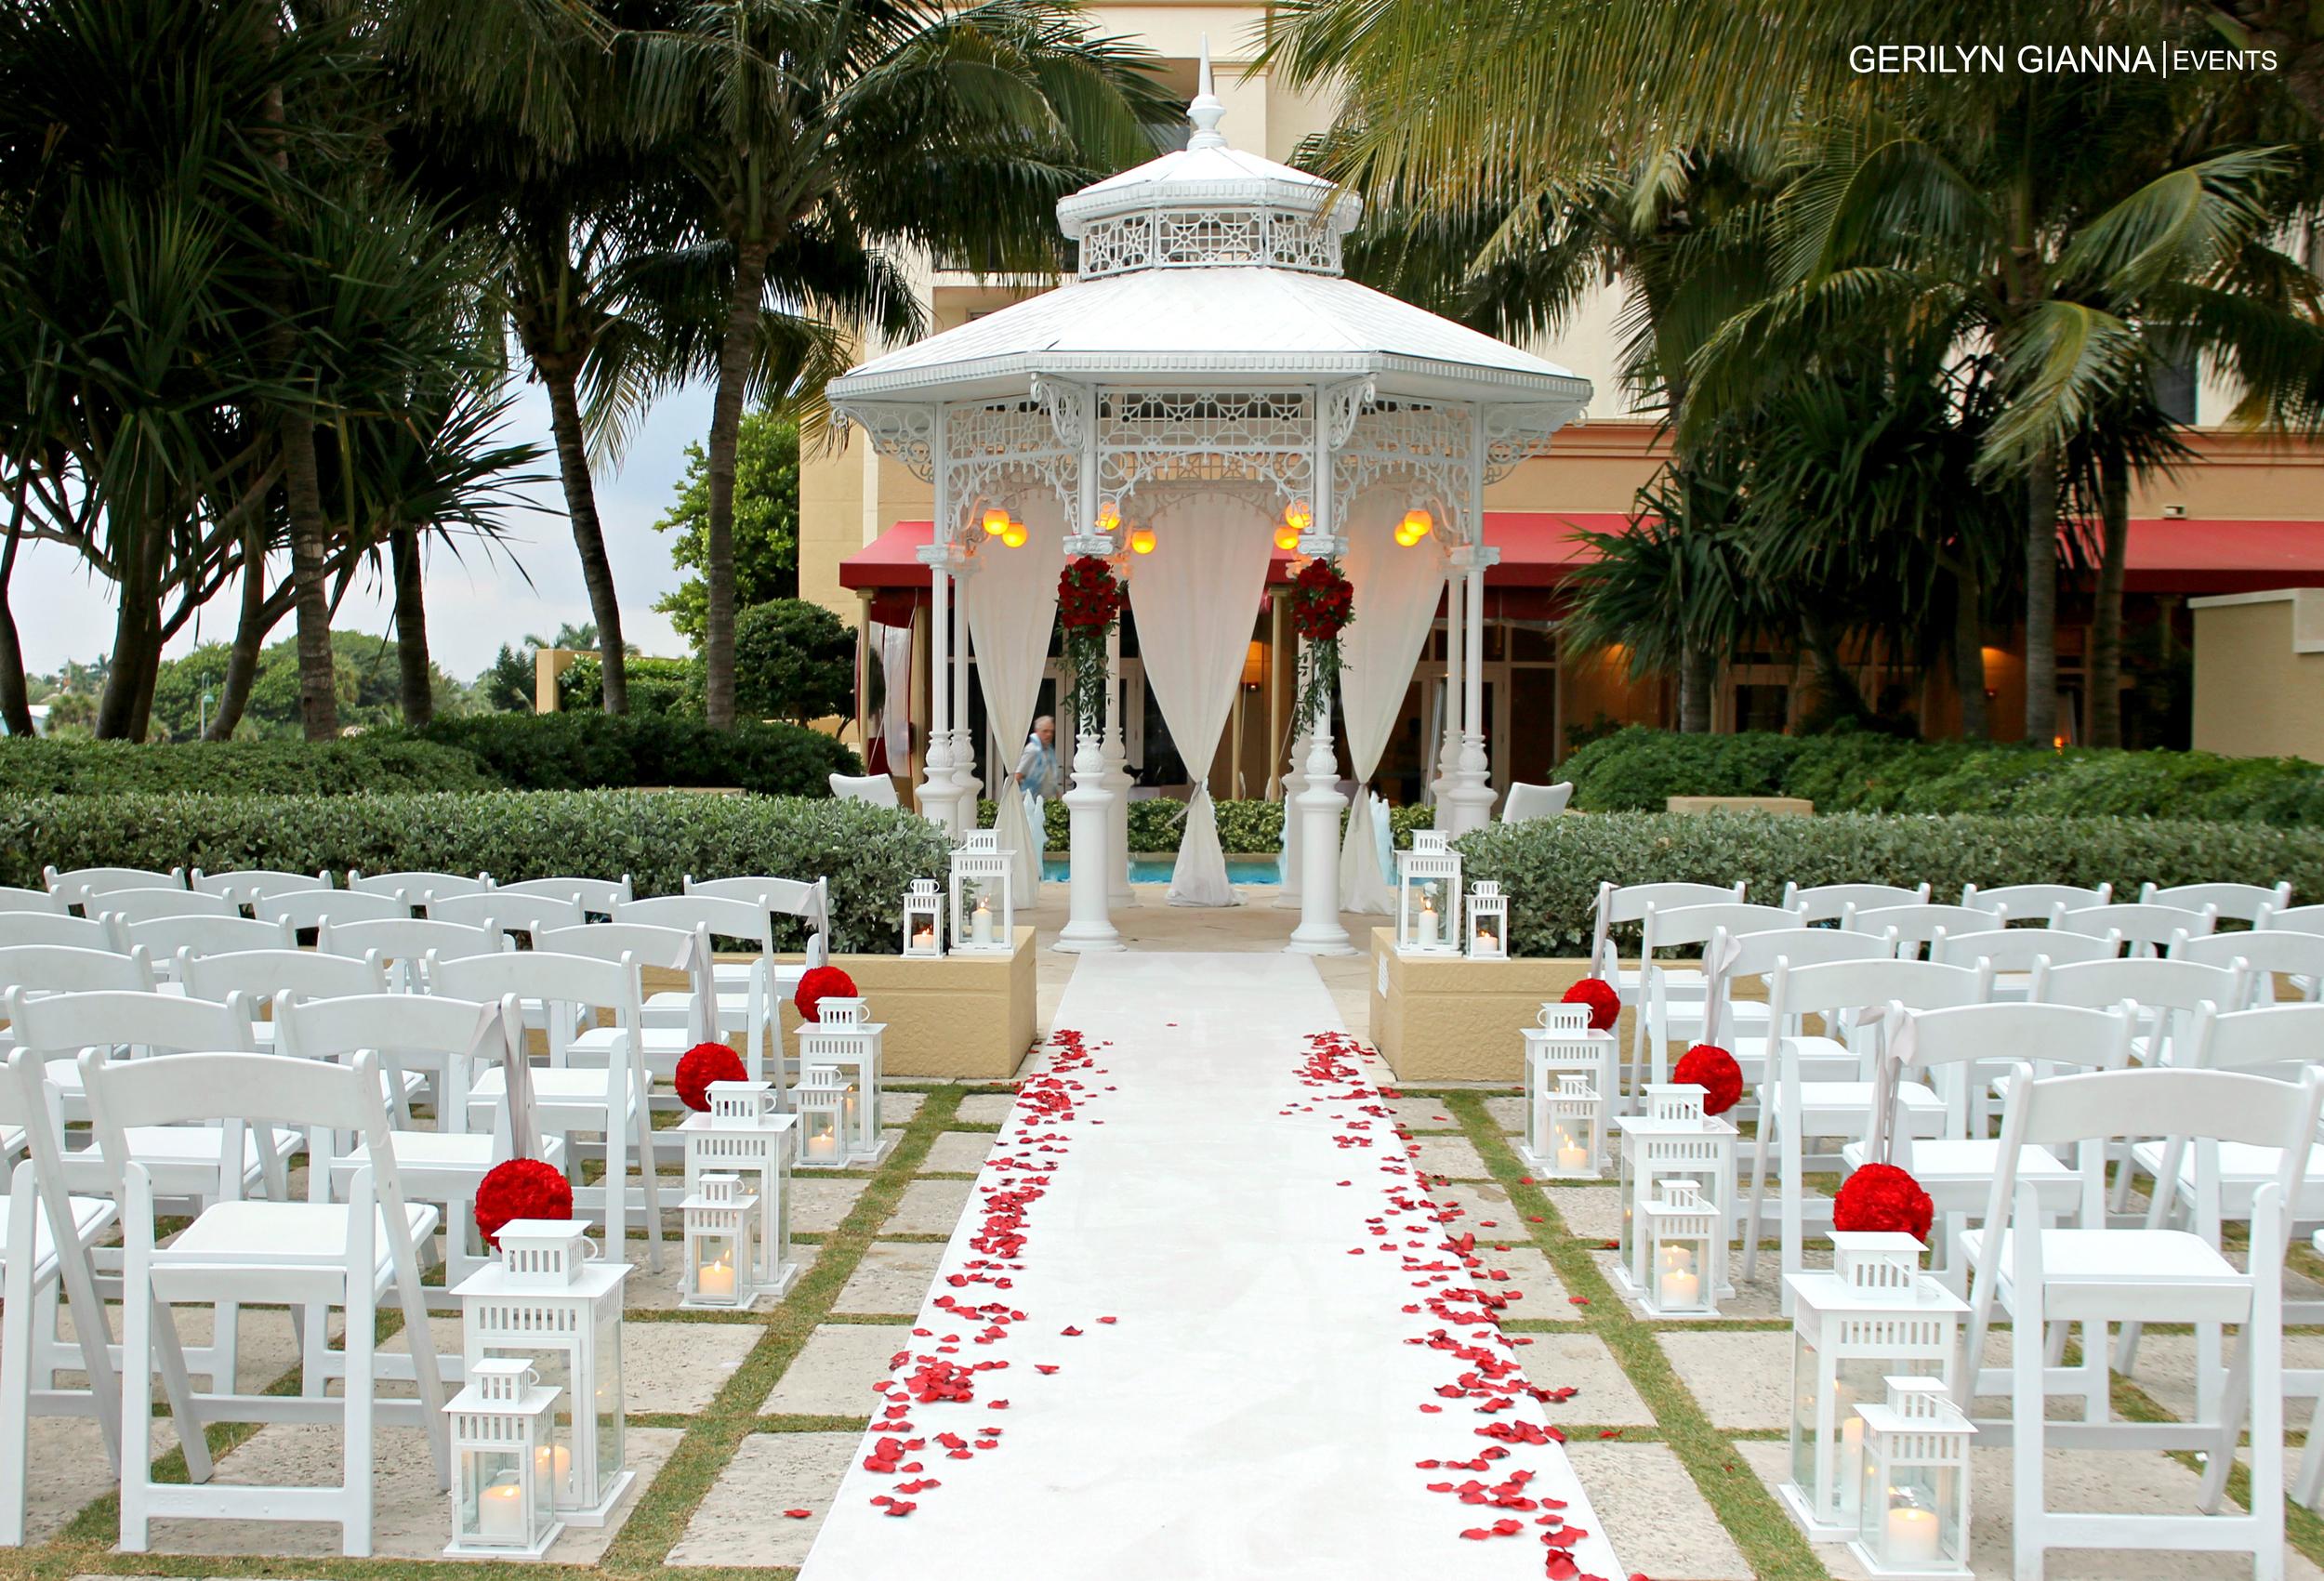 Gerilyn Gianna Event And Floral Design Palm Beach Wedding Ceremony Decor And Design Gerilyn Gianna